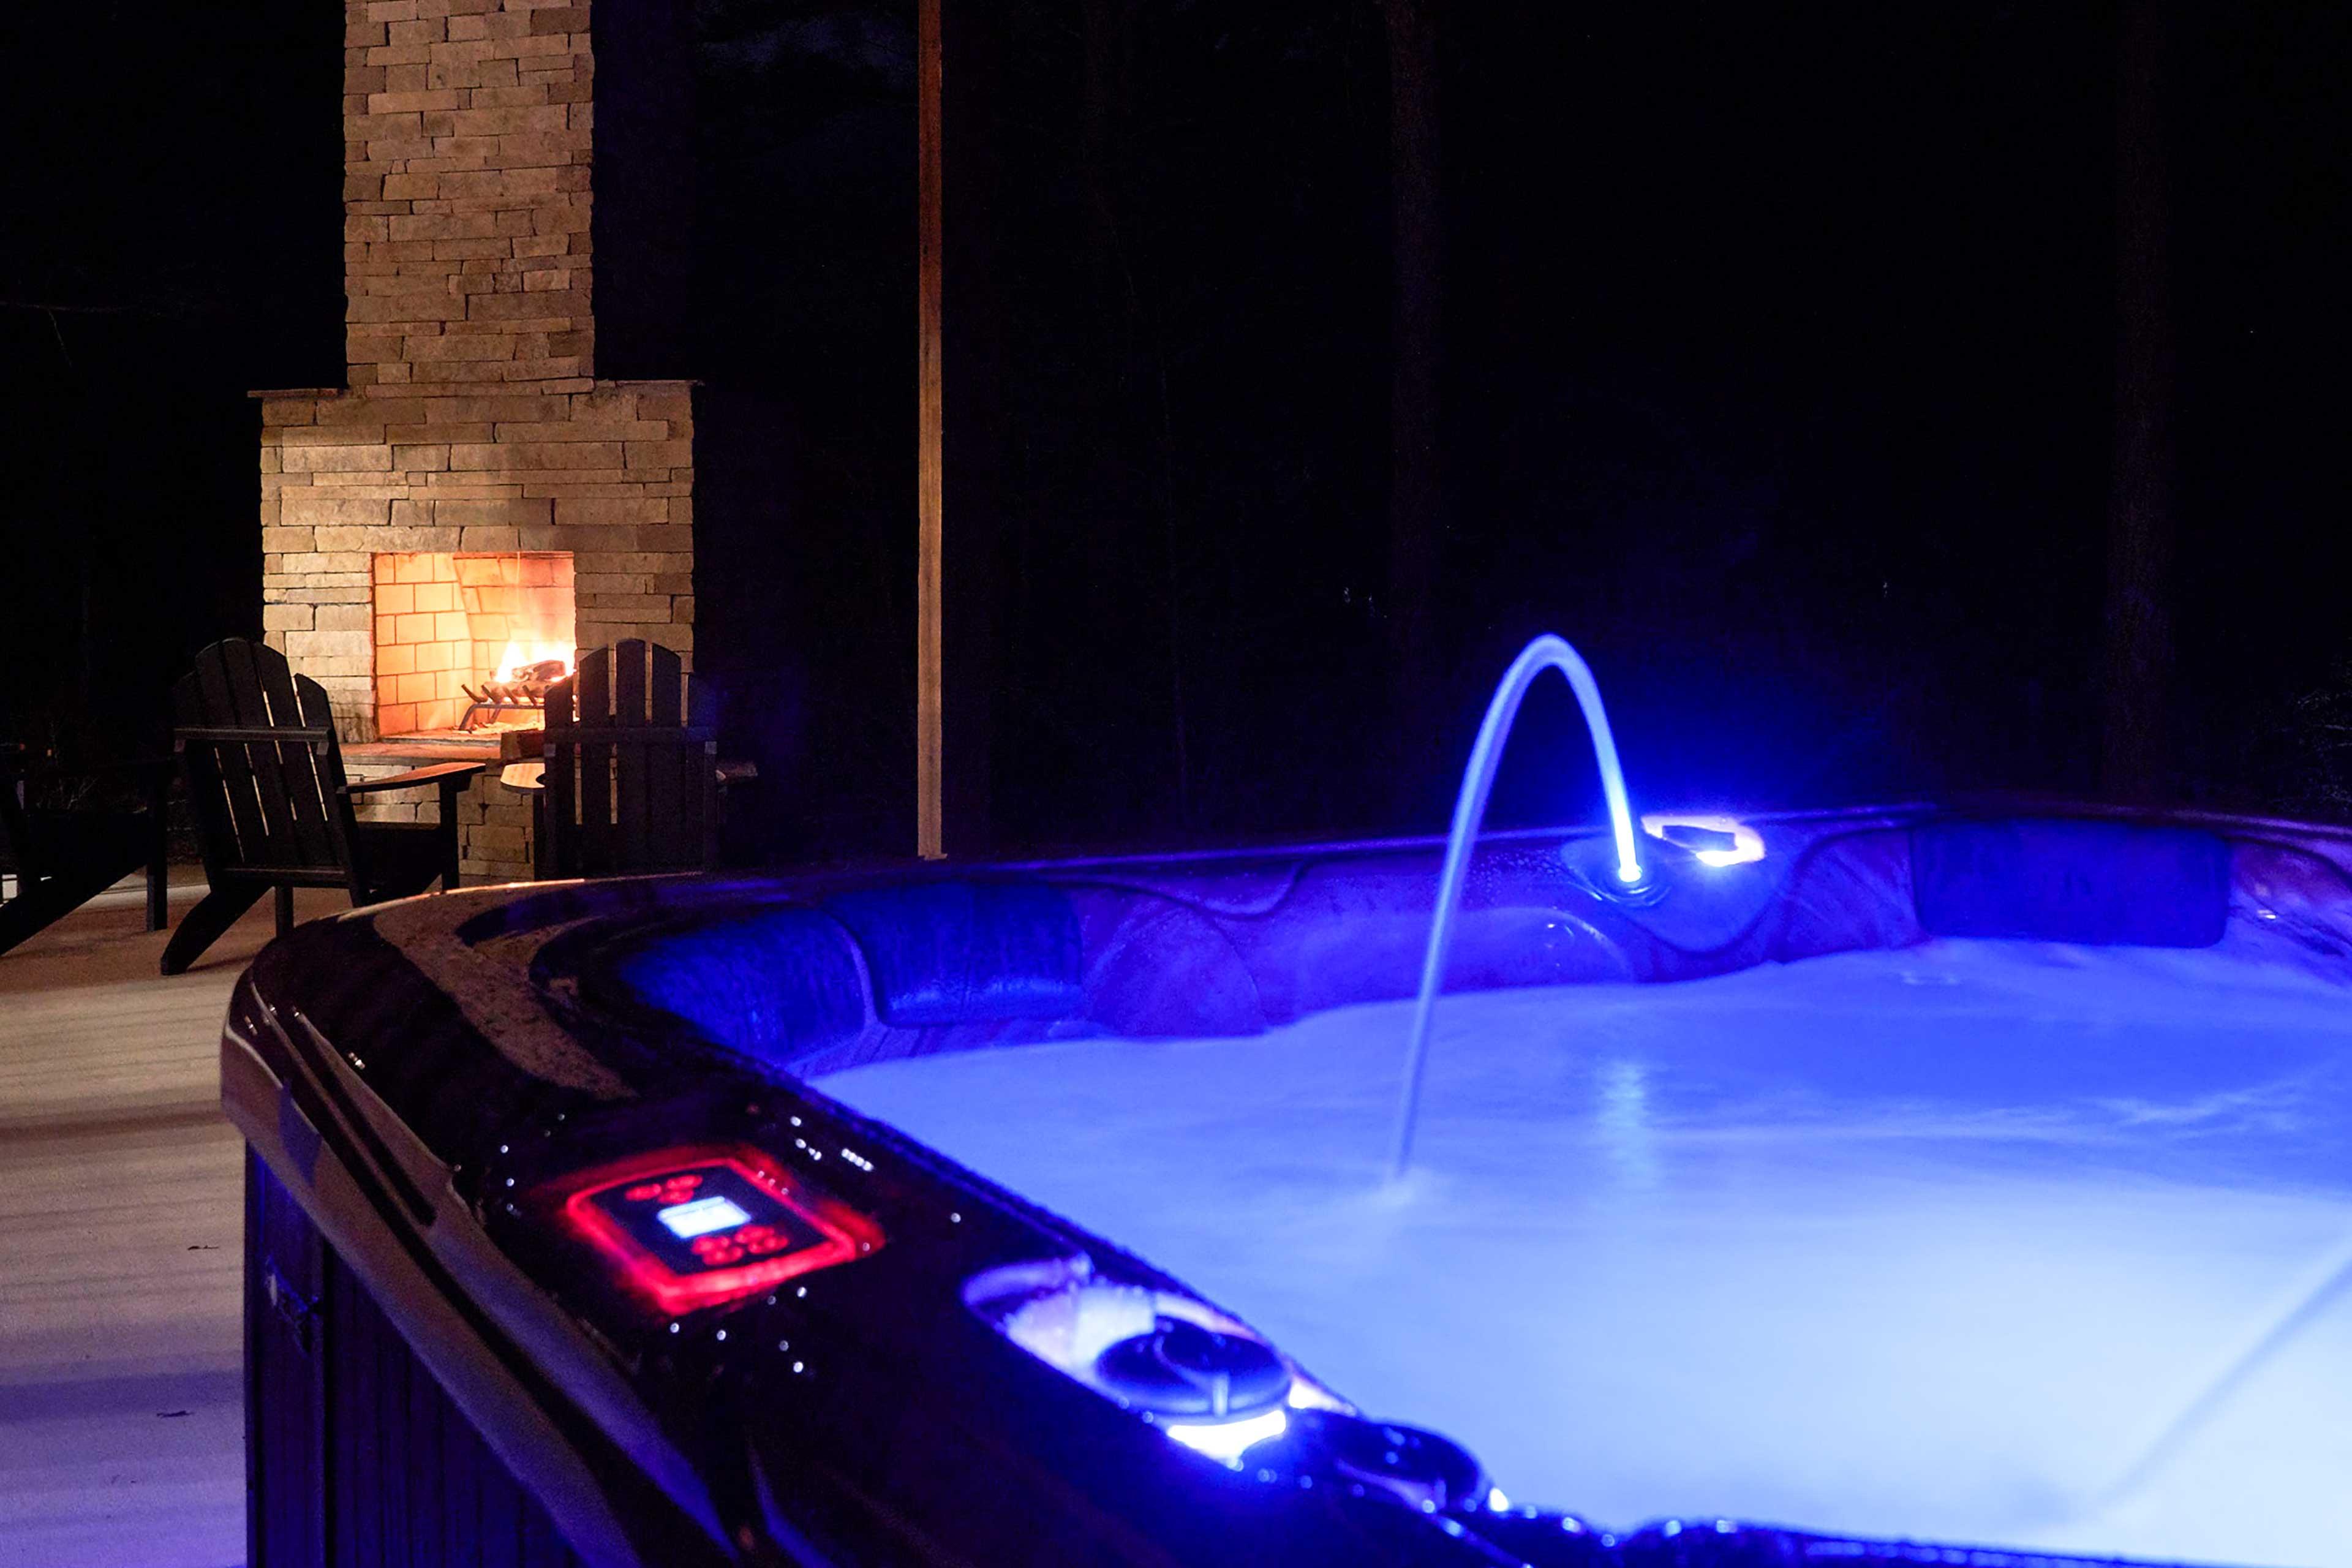 Night Photos | Illuminated Hot Tub & Patio